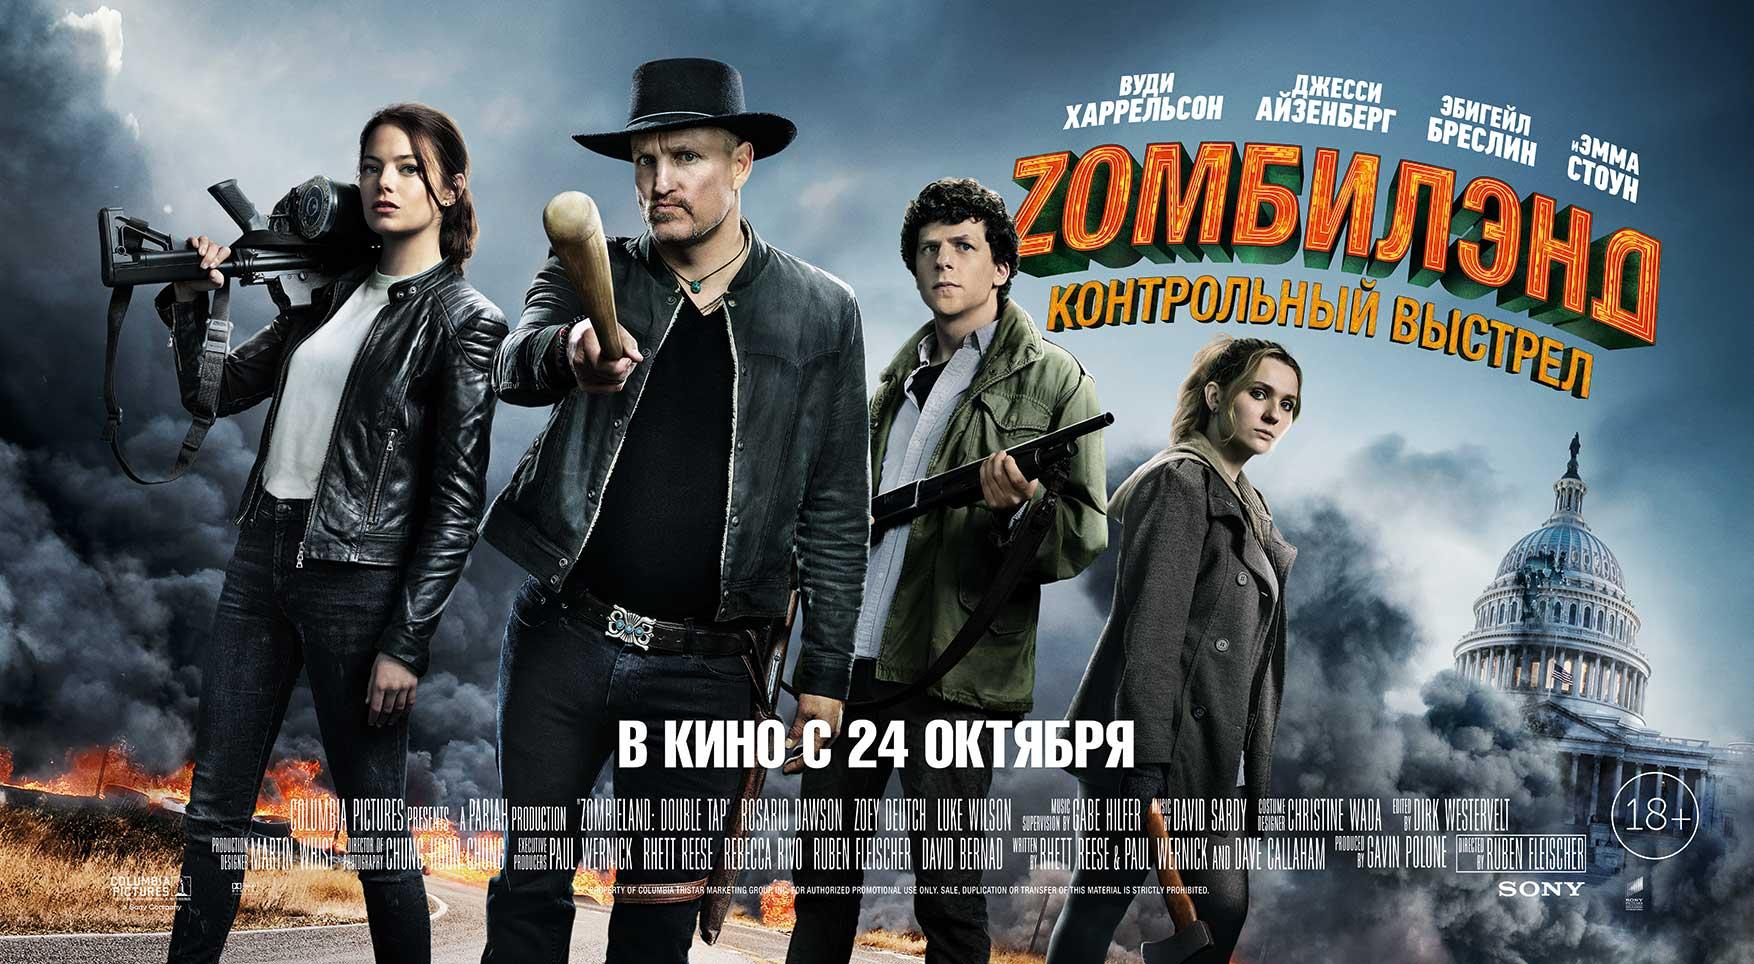 Woody Harrelson, Jesse Eisenberg, Abigail Breslin, and Emma Stone in Zombieland Double Tap (2019) Russia